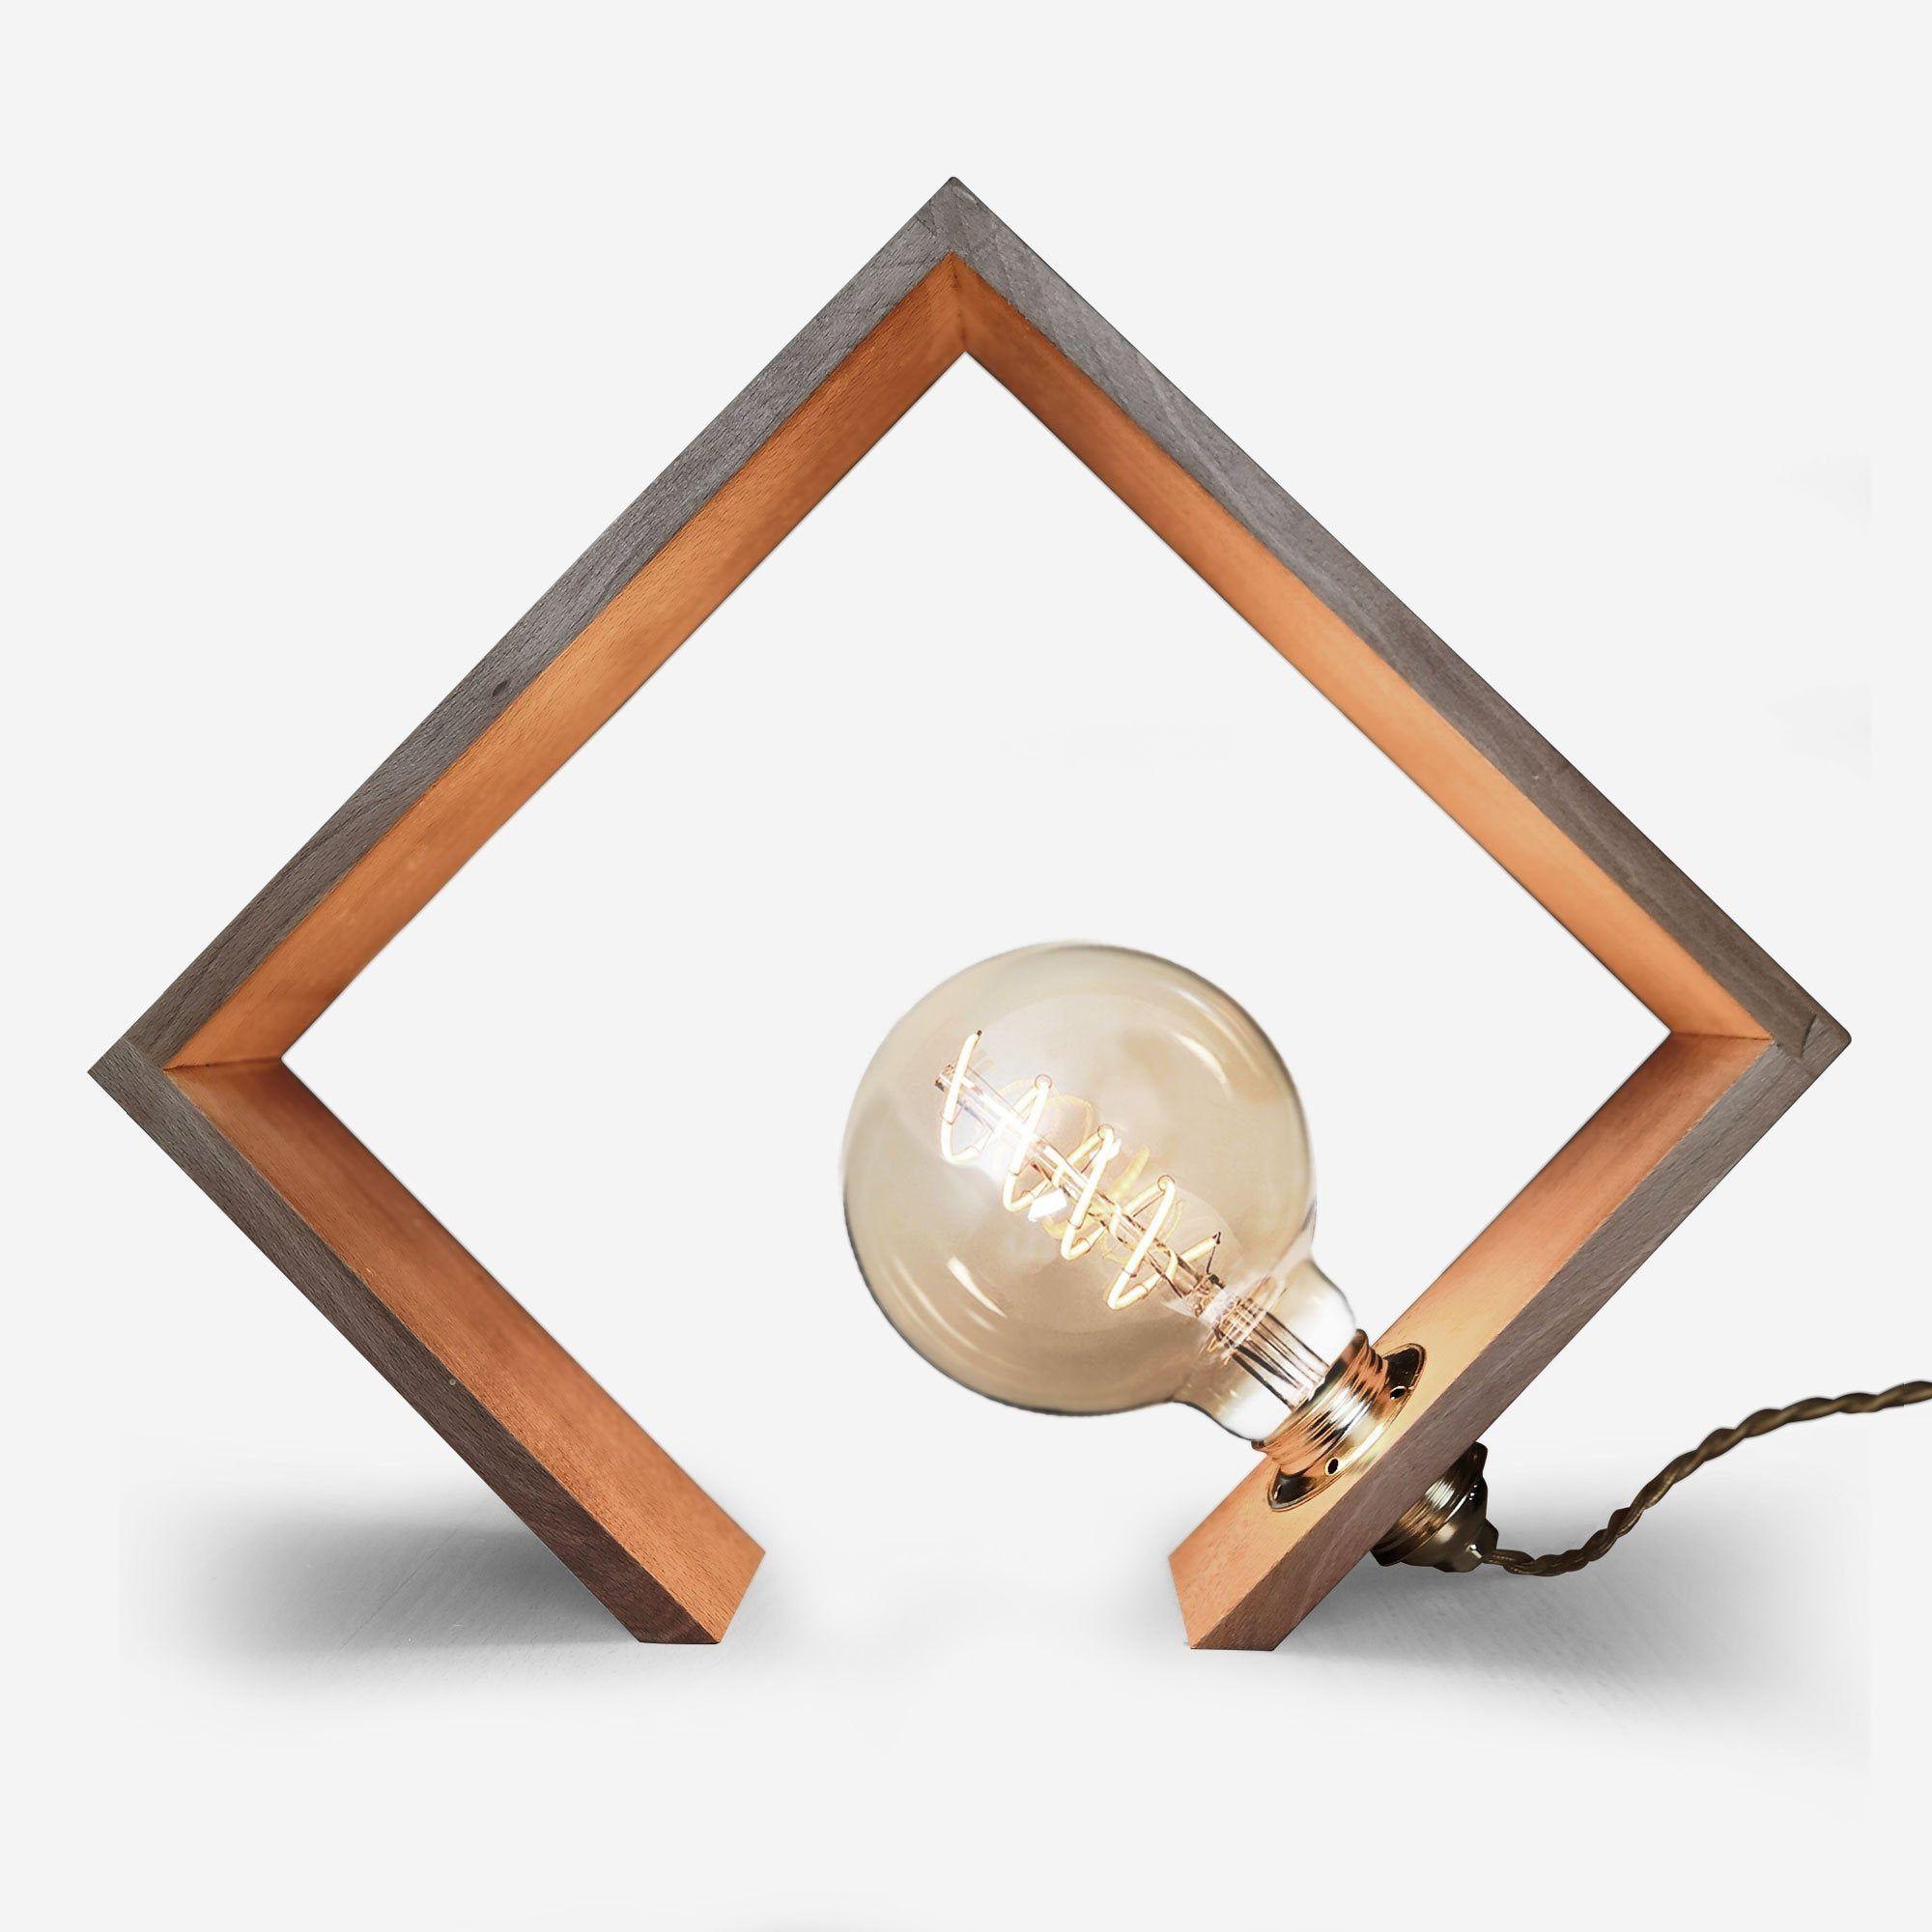 Amandine Wood Lamp Vintage Led Bulb Lamp Design Lamp Decoration Unique Model Designer Lamp Natural Wood Unique Lighting In 2020 Led Lamp Diy Vintage Led Bulbs Wood Lamps